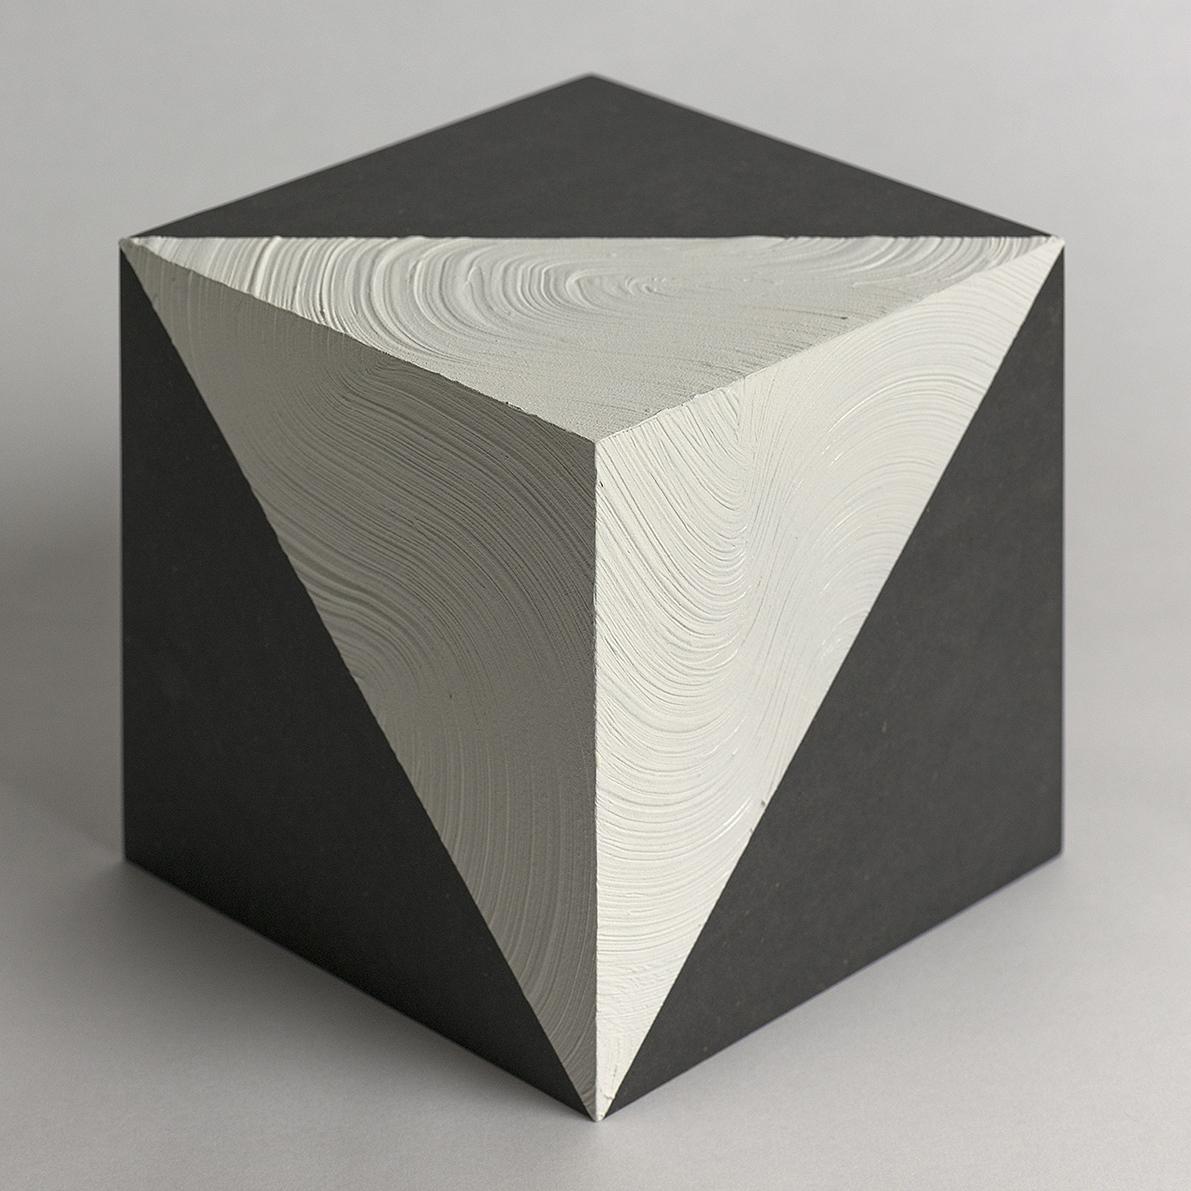 Title: Space | 空間 | No.1 Medium: Arcylic, wood cube Size: 15x15cm